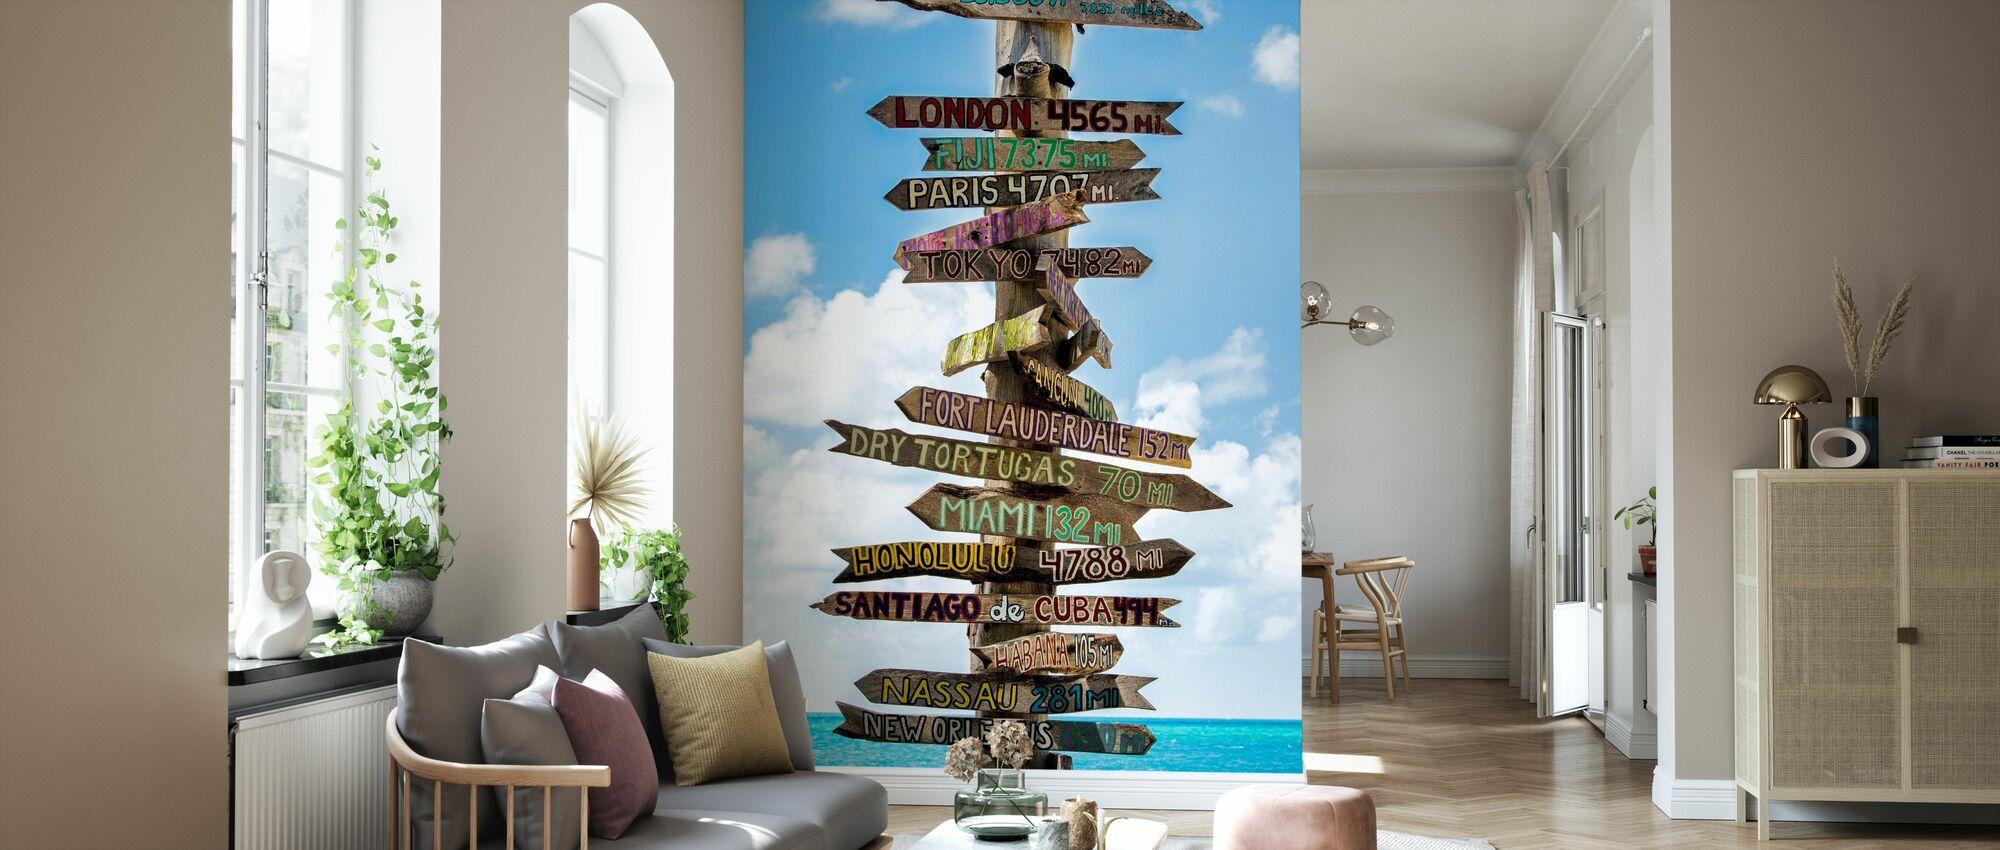 Where to Go - Wallpaper - Living Room